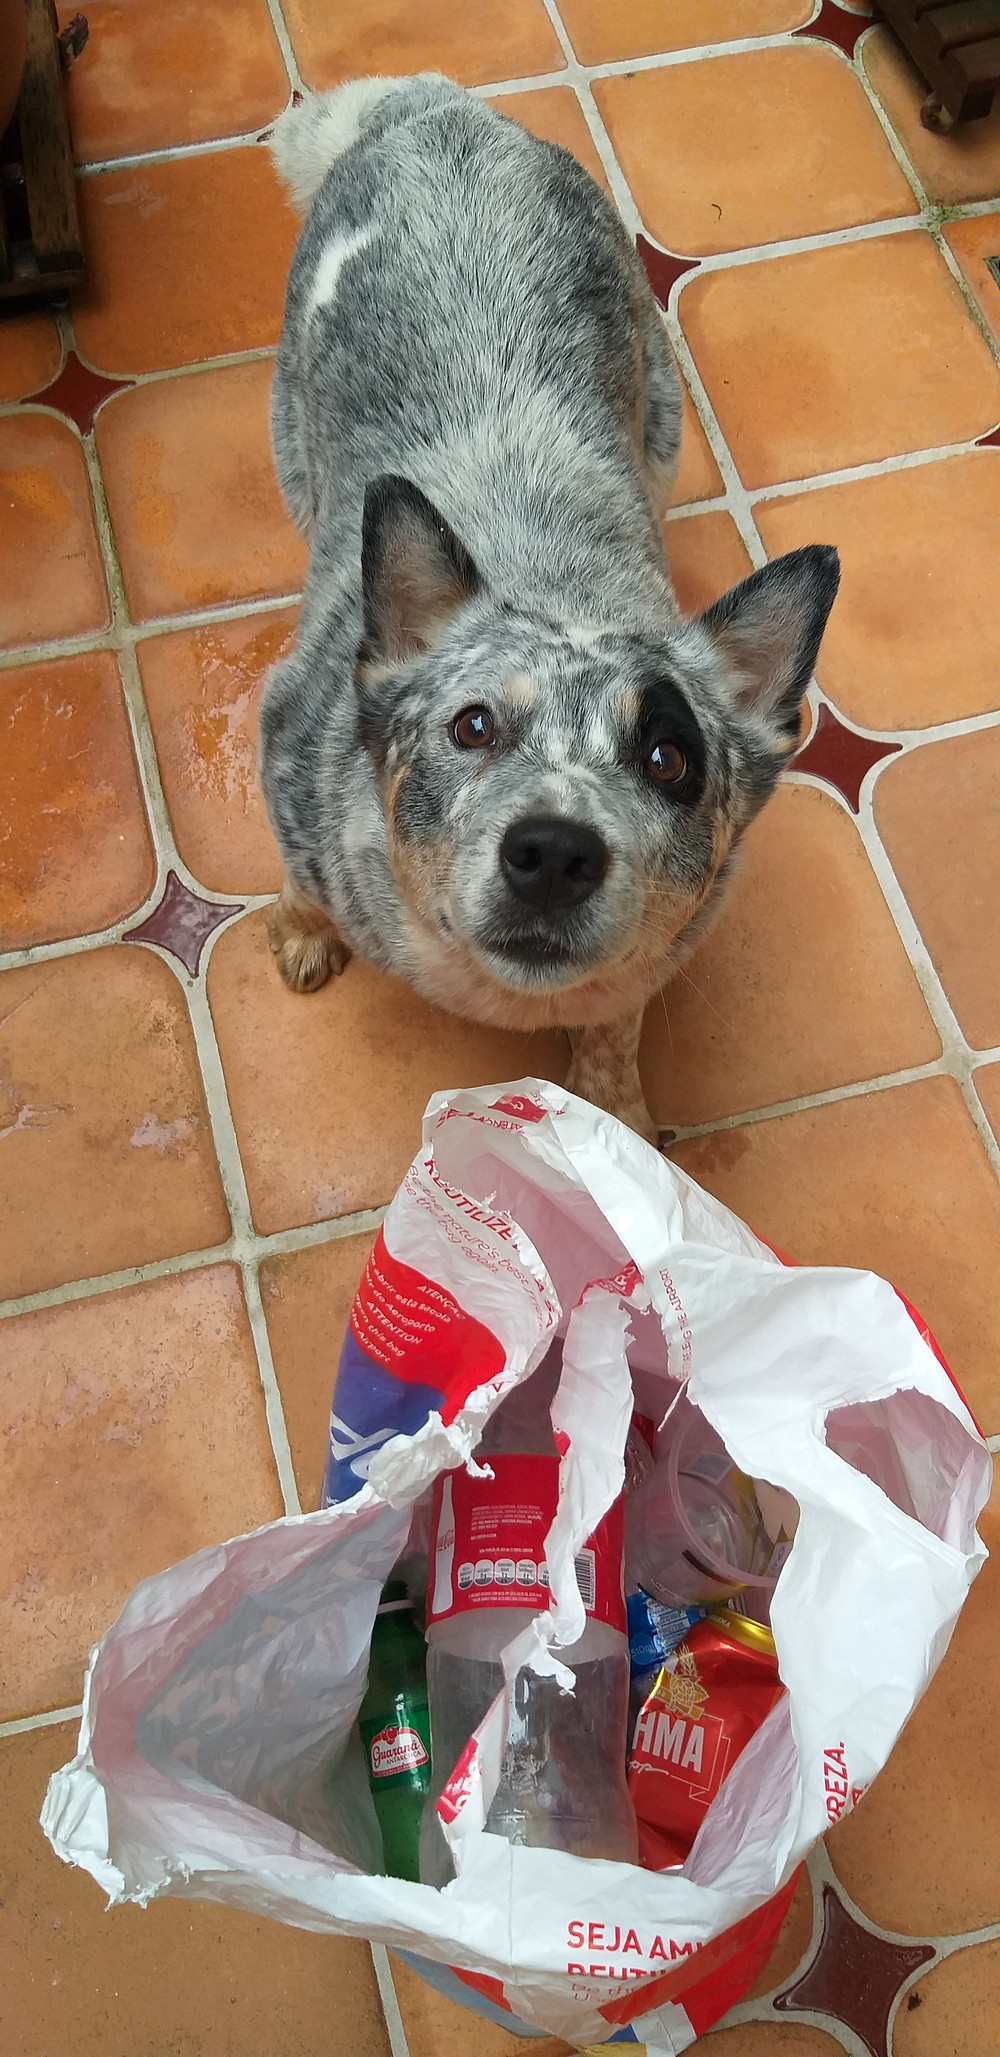 Cachorro ao lado de sacola com lixo recolhido durante atividade do dia mundial da limpeza 2019.